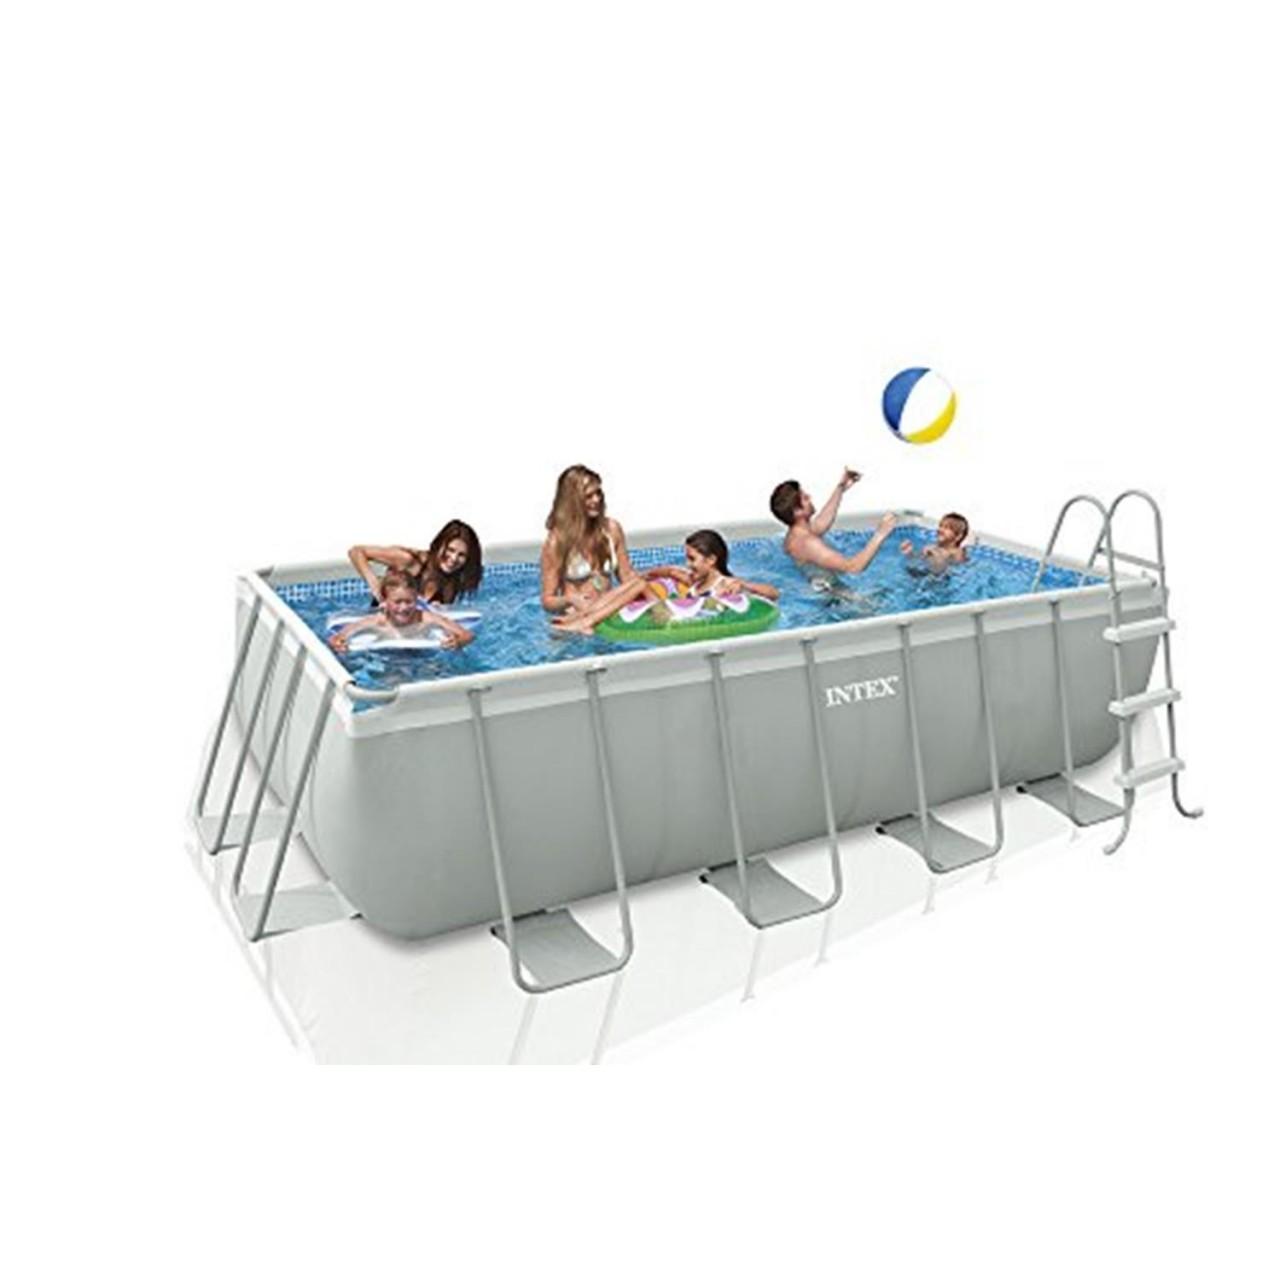 Intex Ultra Frame Pool 400x200x100cm Stahlrohrbecken Swimming Pool Pumpe Leiter